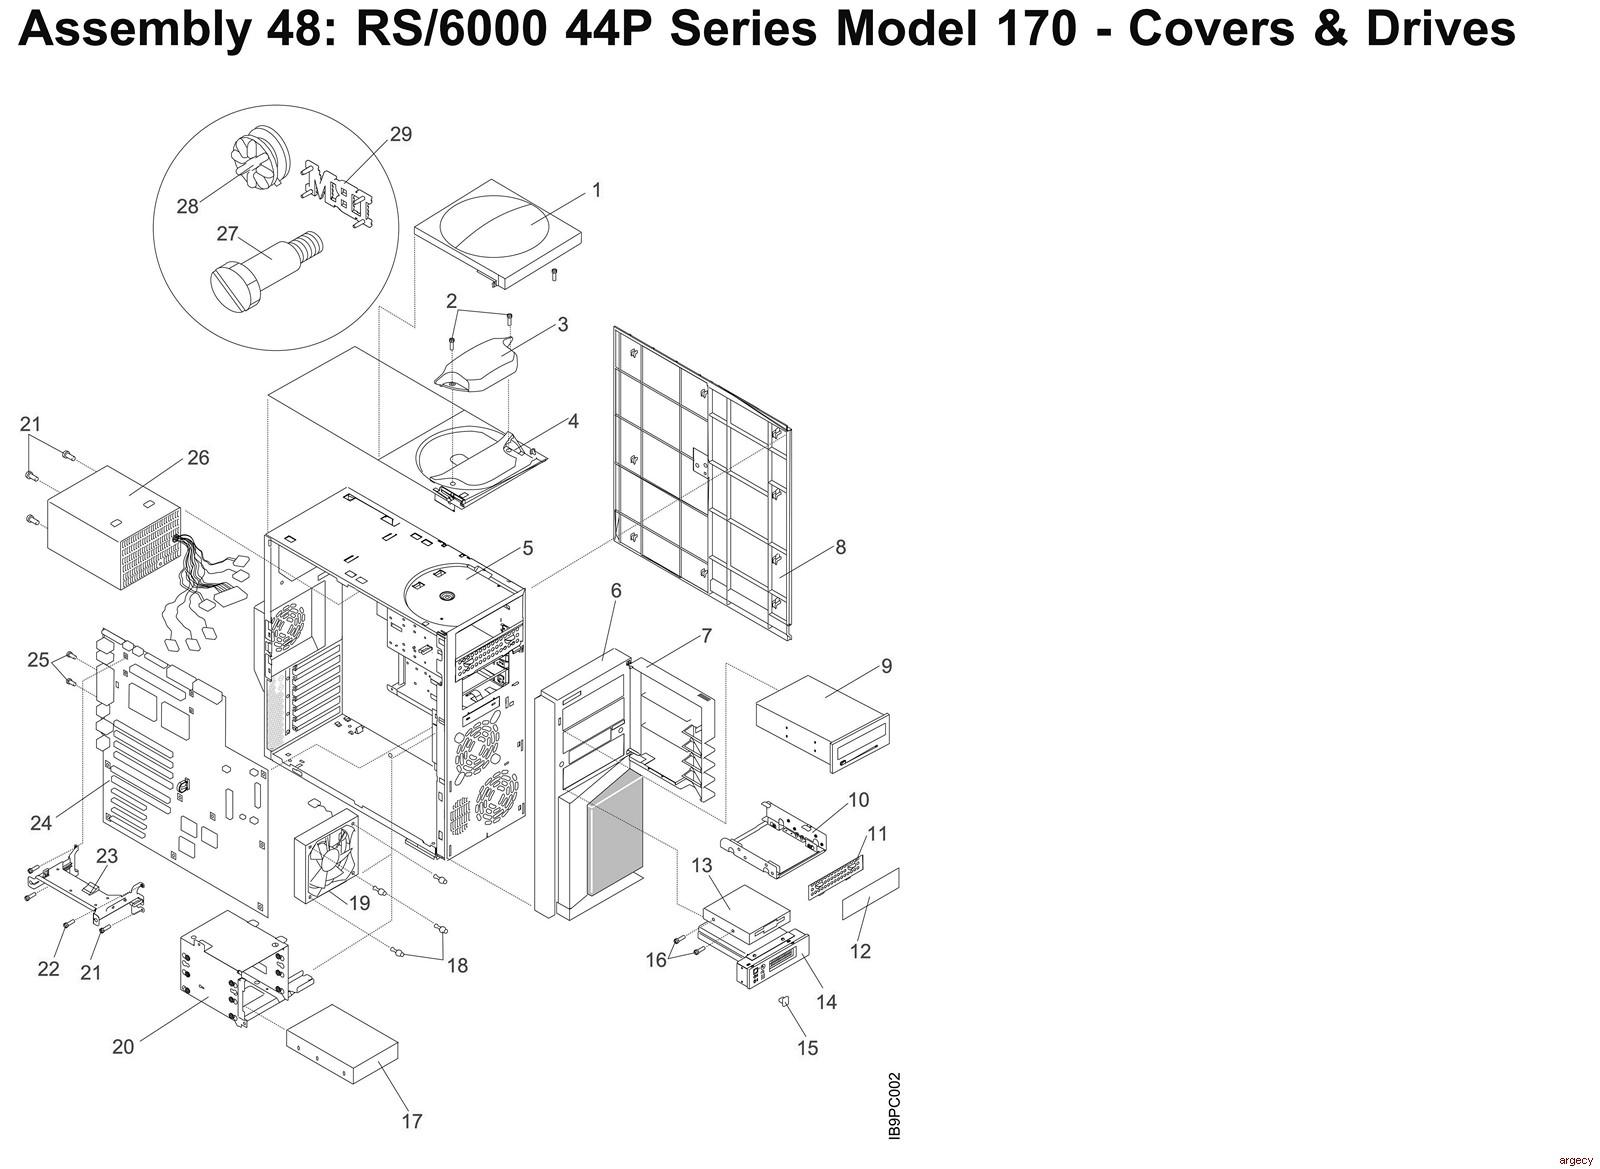 https://www.argecy.com/images/4000-parts-3413.jpg